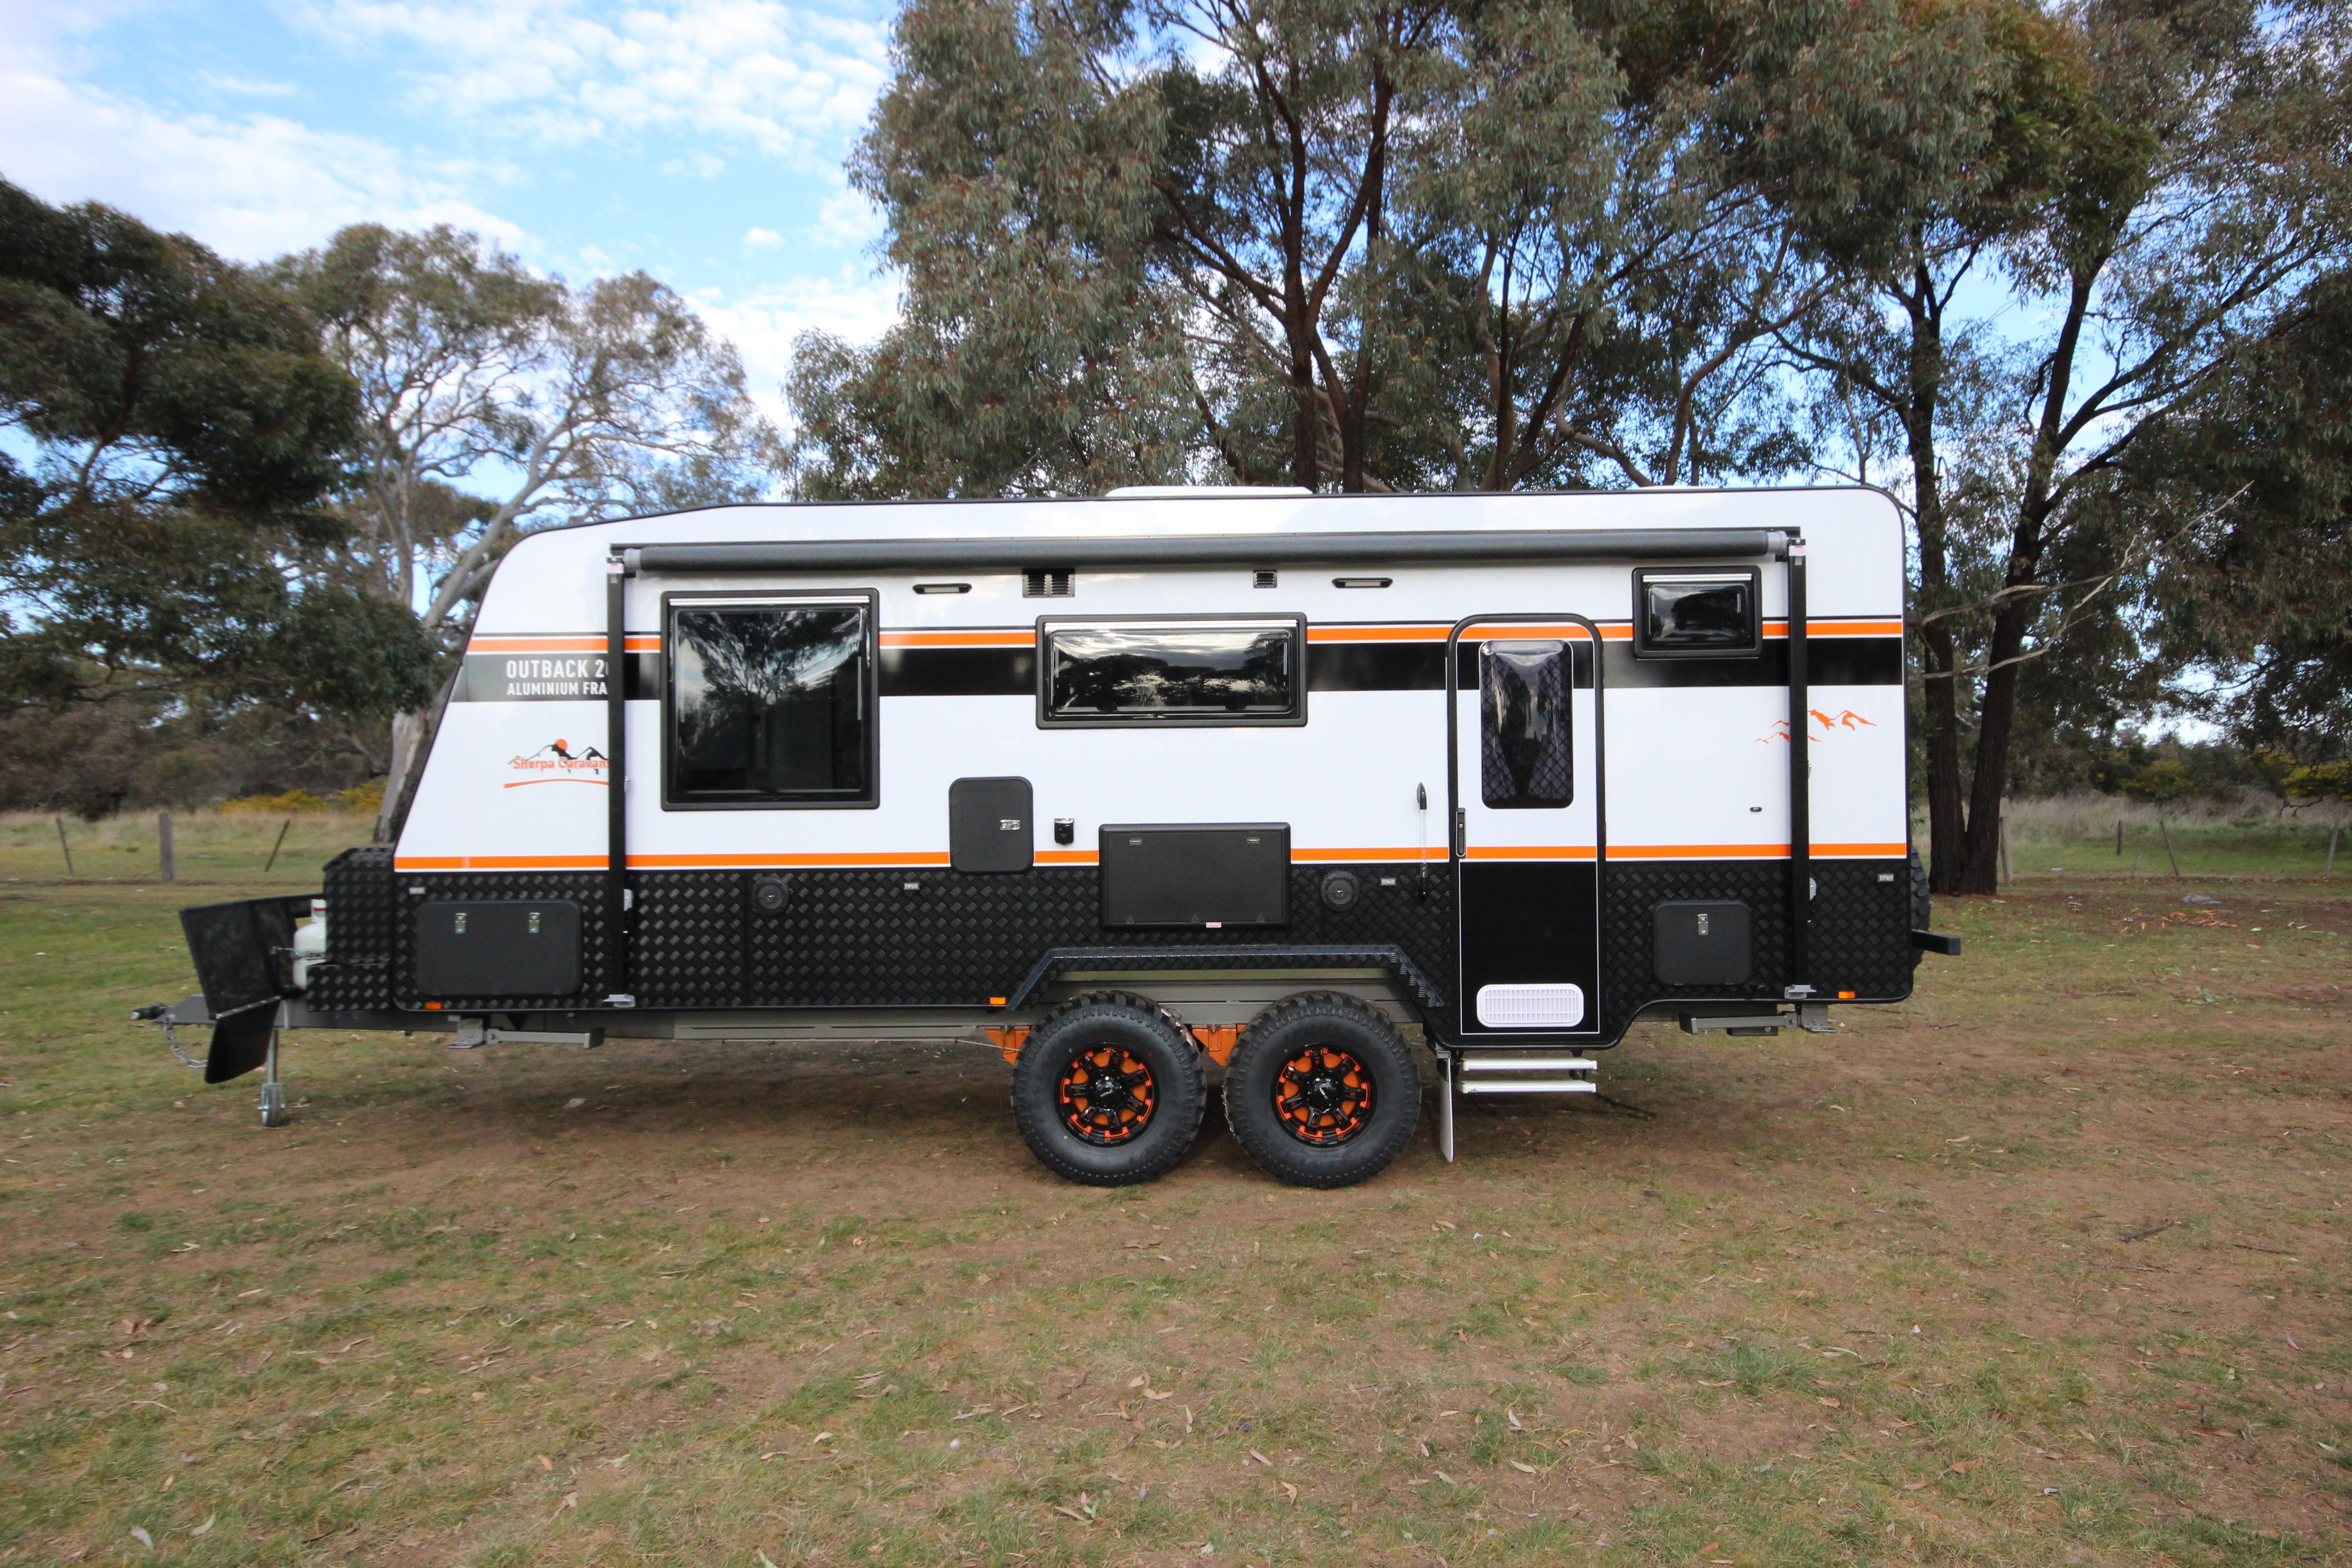 eden-caravans-outback-208-7jpg